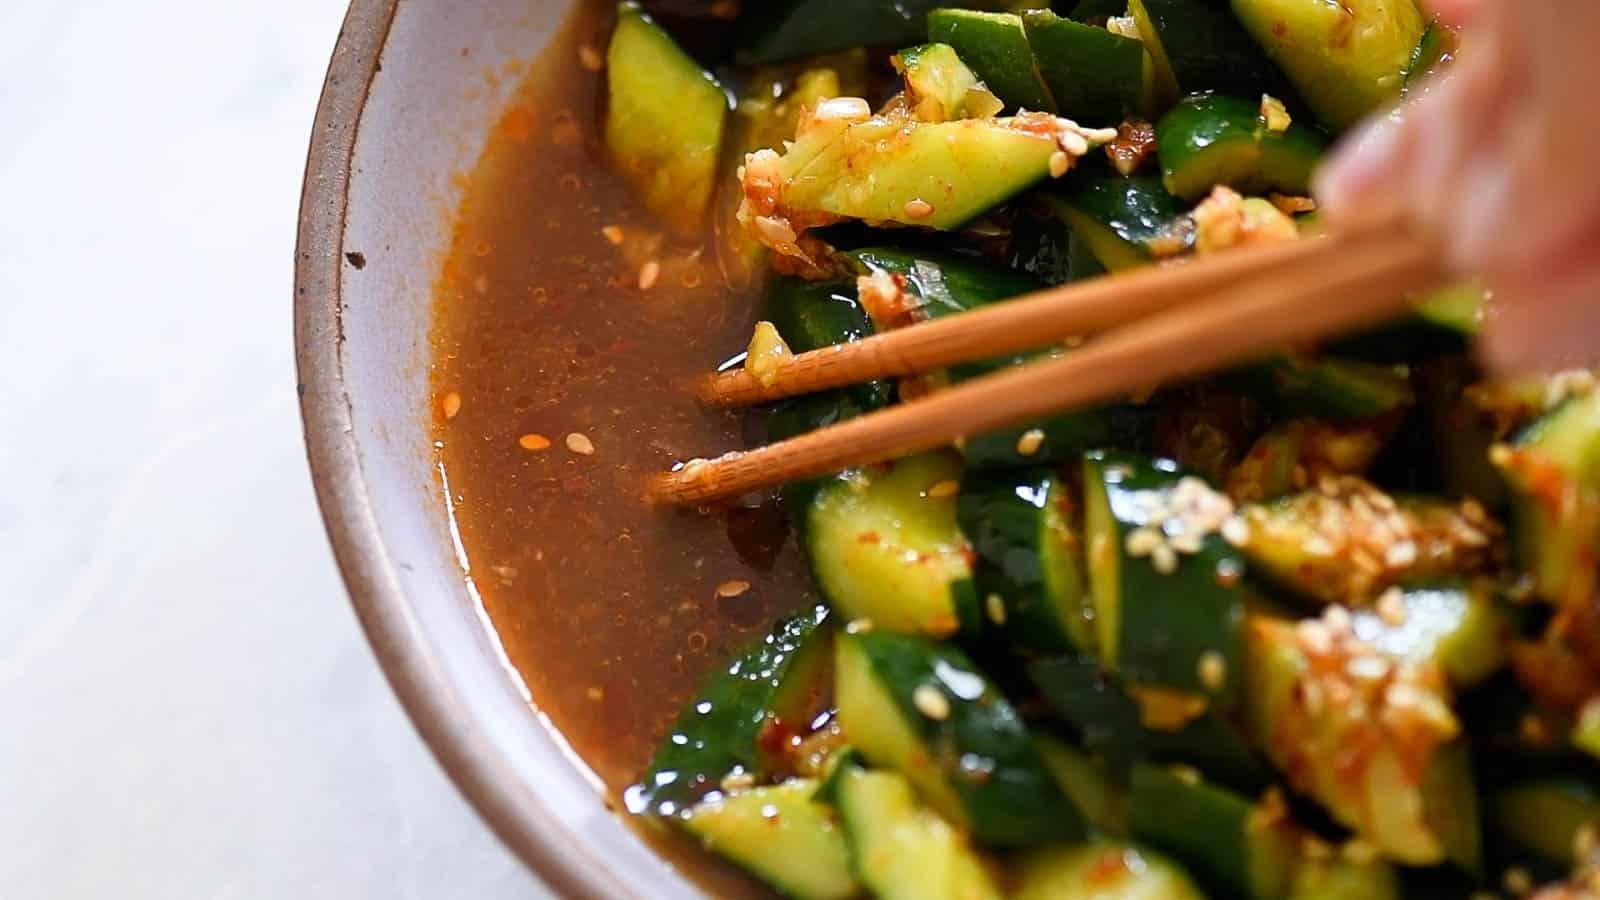 Excess liquid from garlic cucumber salad